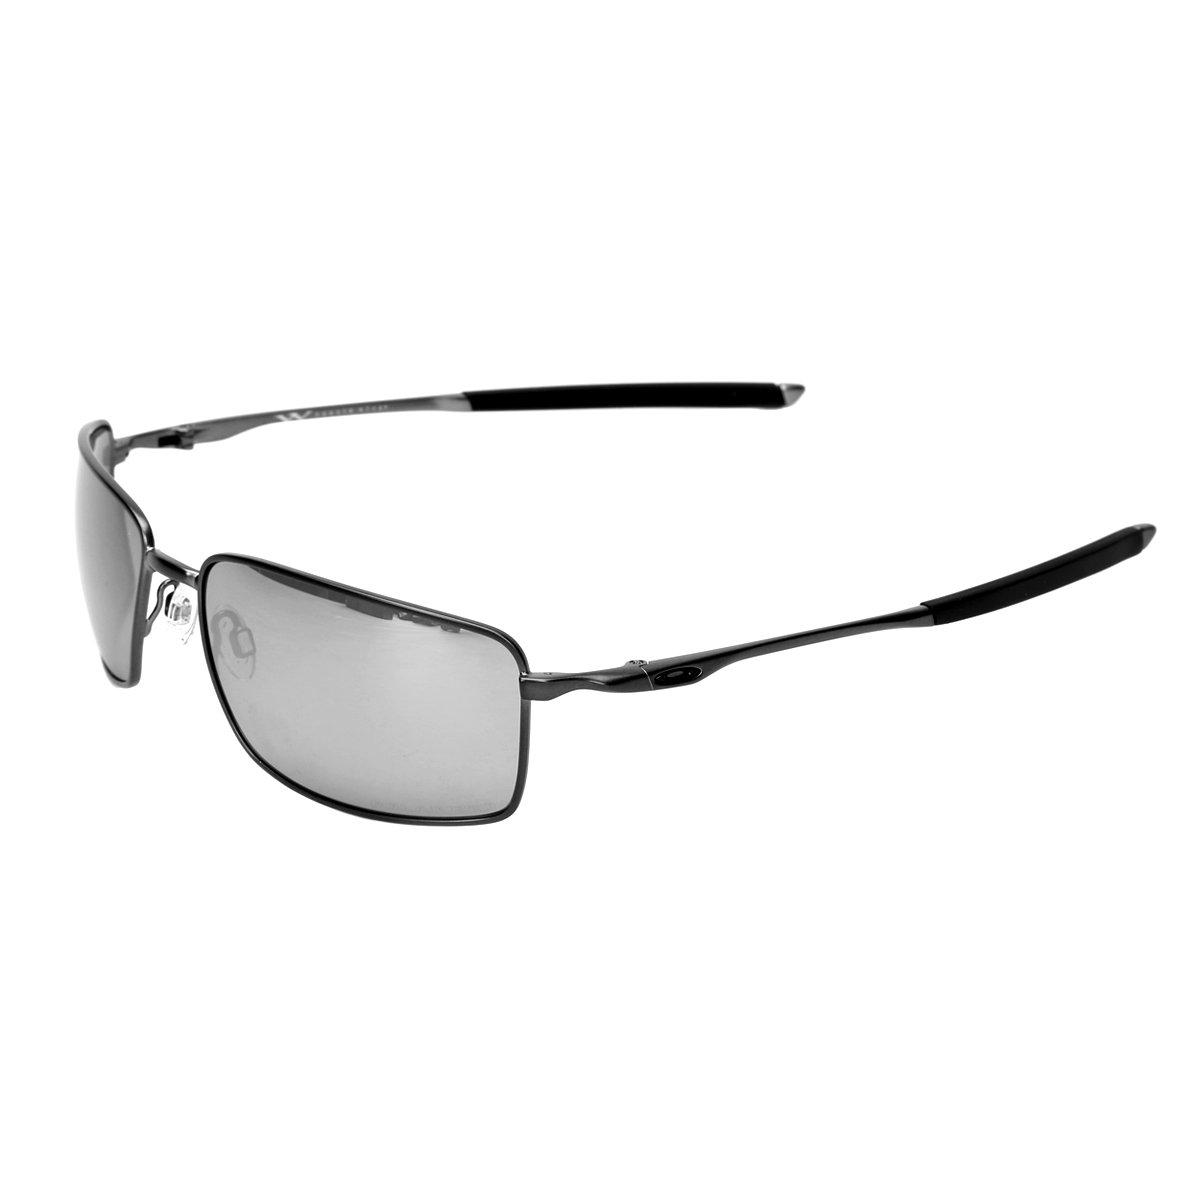 Óculos de Sol Oakley Square Wire Iridium - Compre Agora  8b455122afa